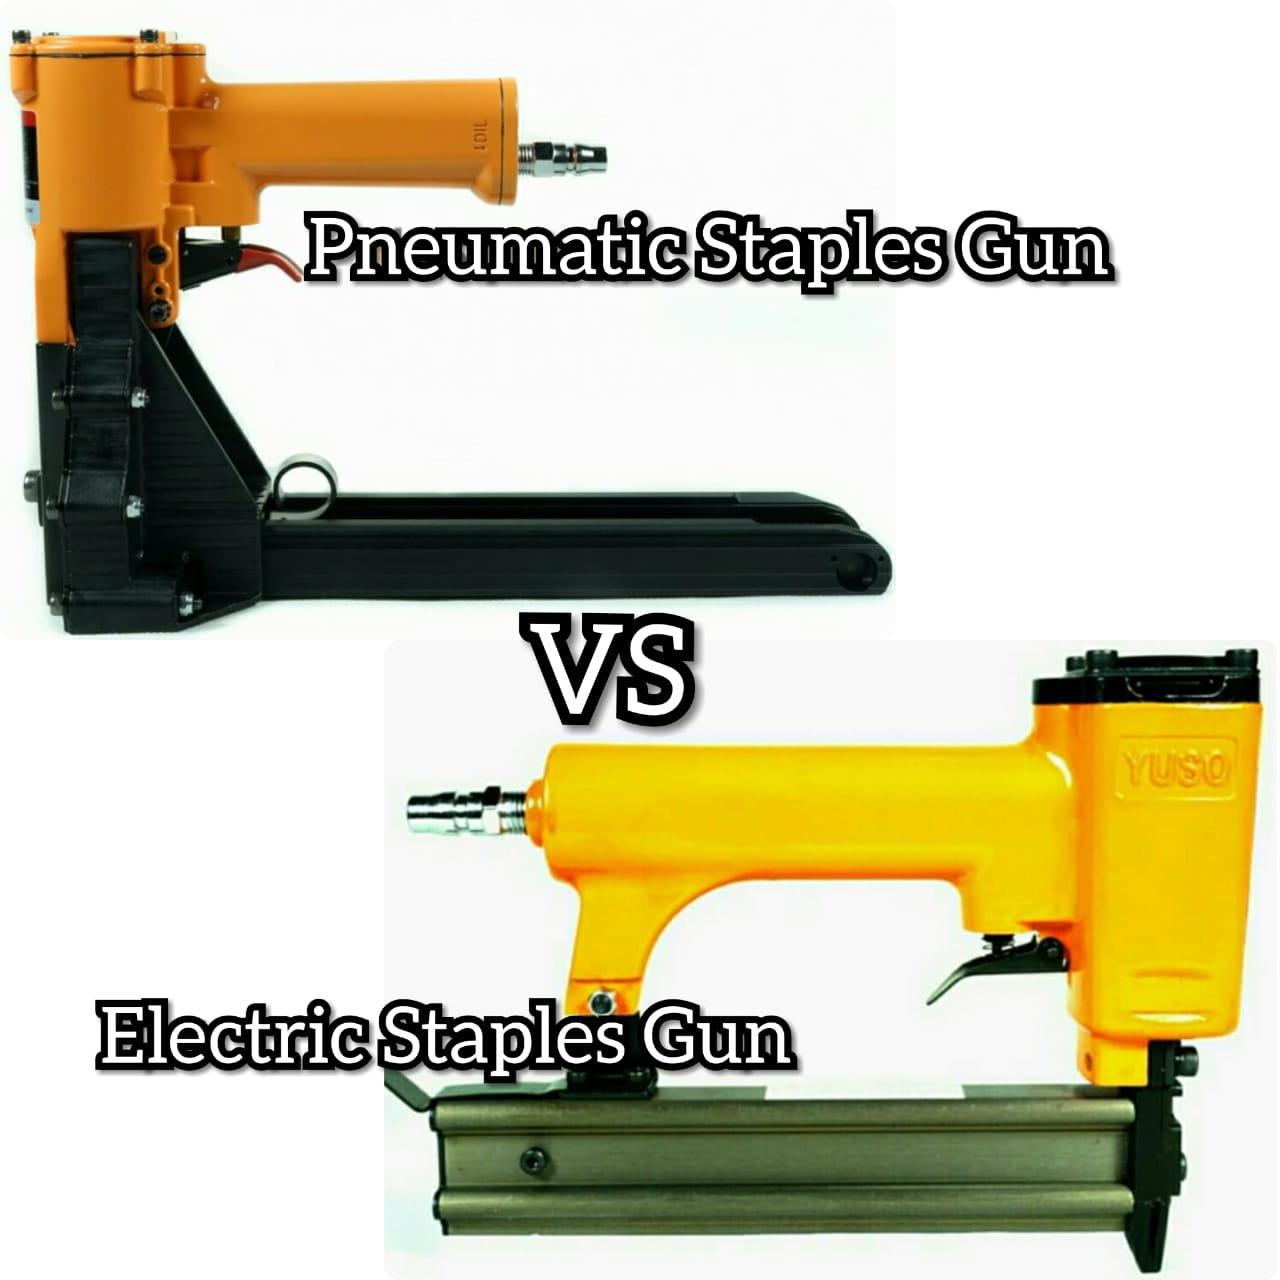 Pneumatic Staple Gun vs Electric Staple Gun